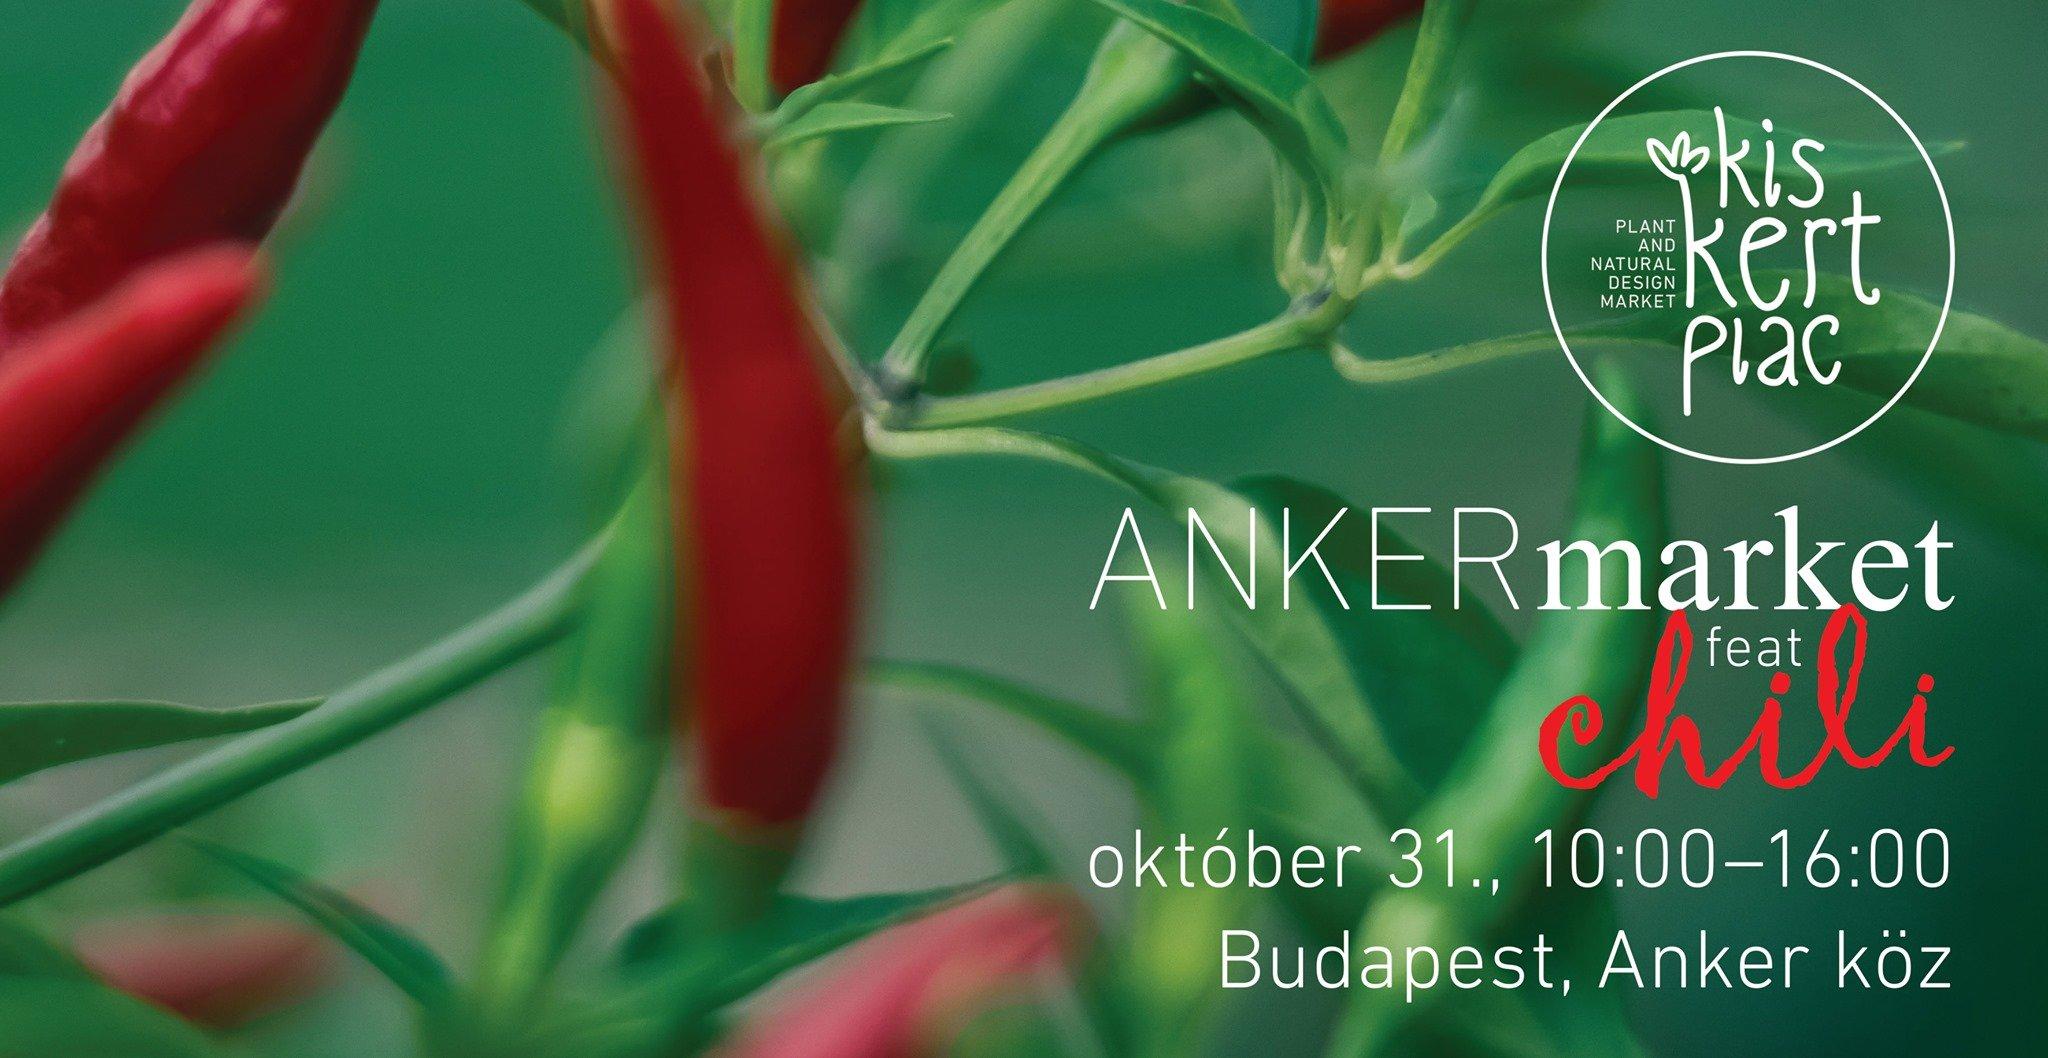 Plant and natural design market